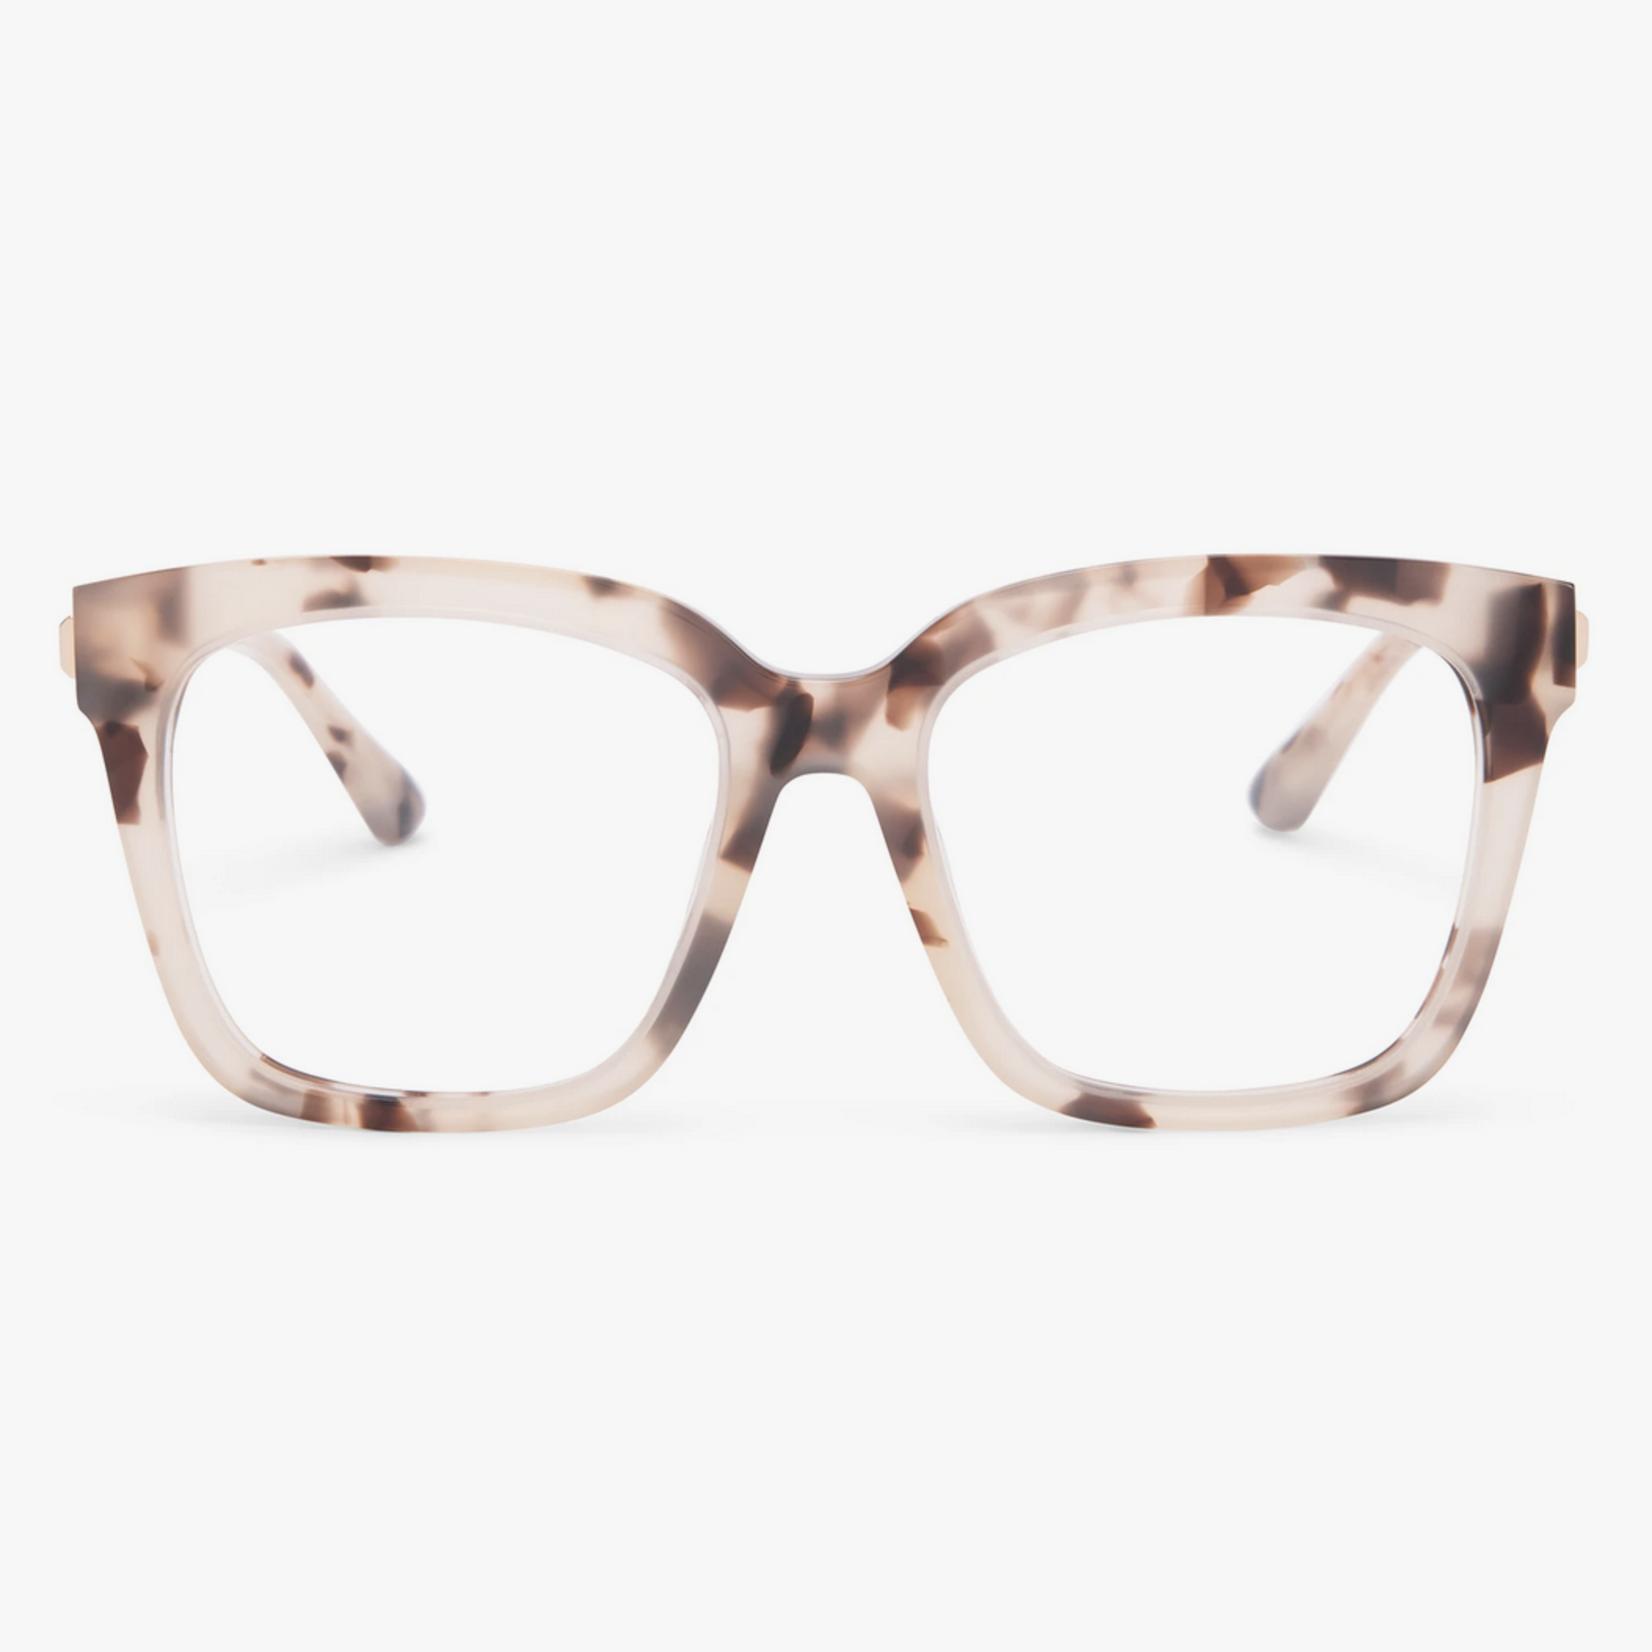 Diff - Bella blue light glasses